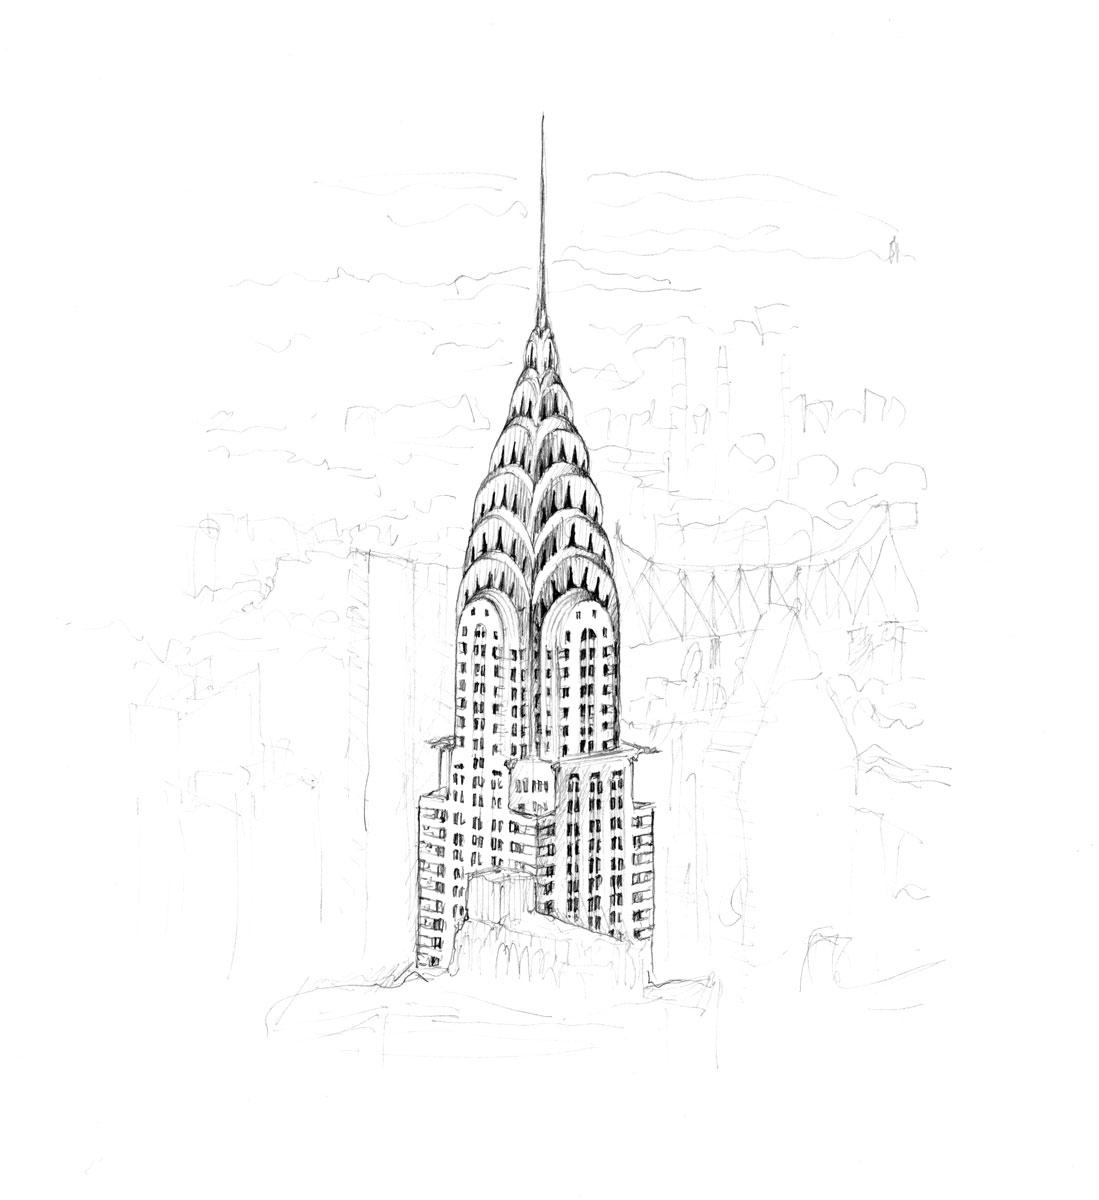 NY-ChryslerBuilding-03.jpg